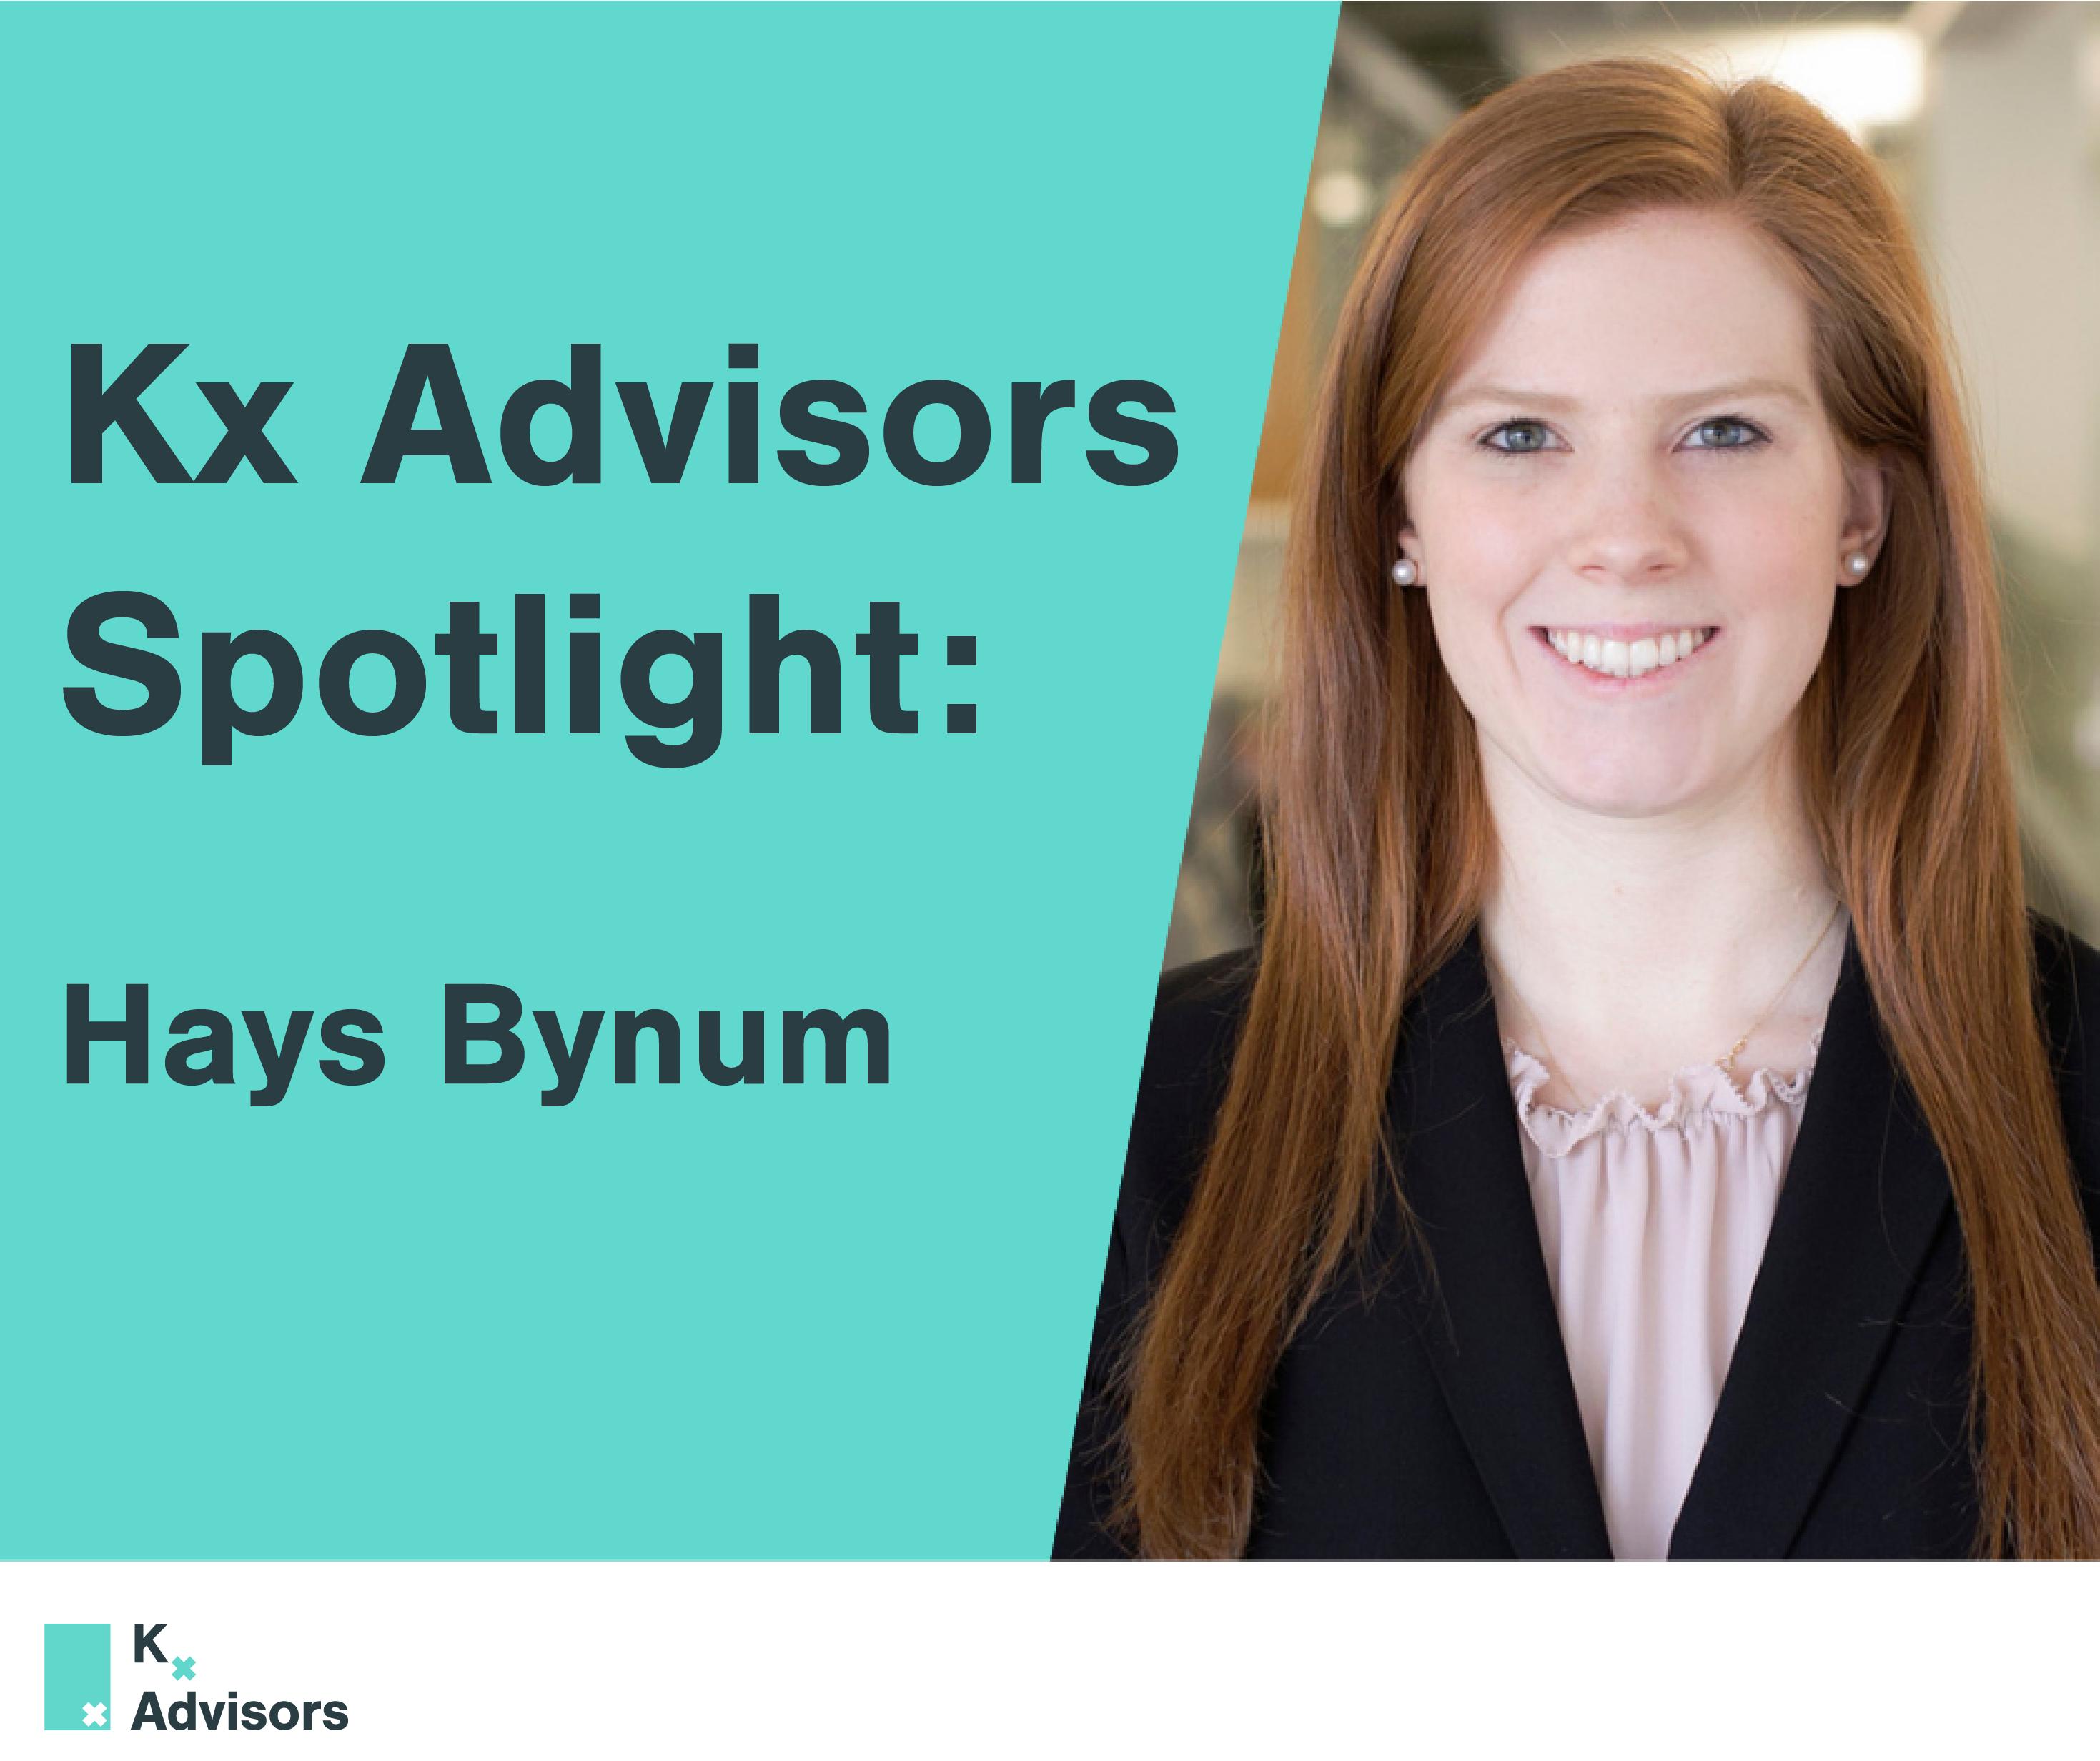 Kx Advisors Spotlight: Hays Bynum